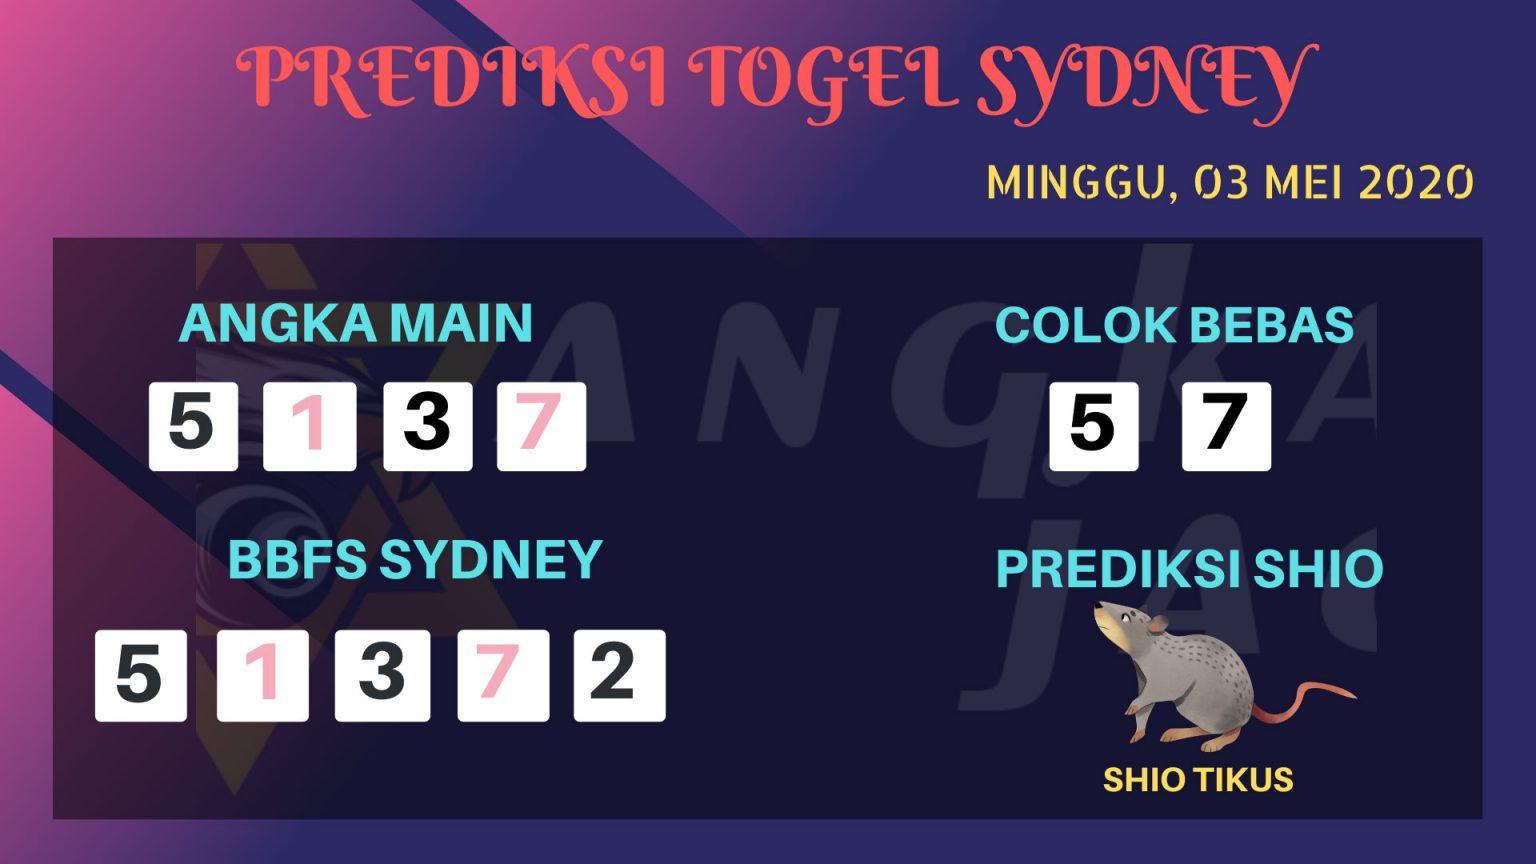 Prediksi Togel Sydney 03 Mei 2020 - Prediksi Angka Jadi